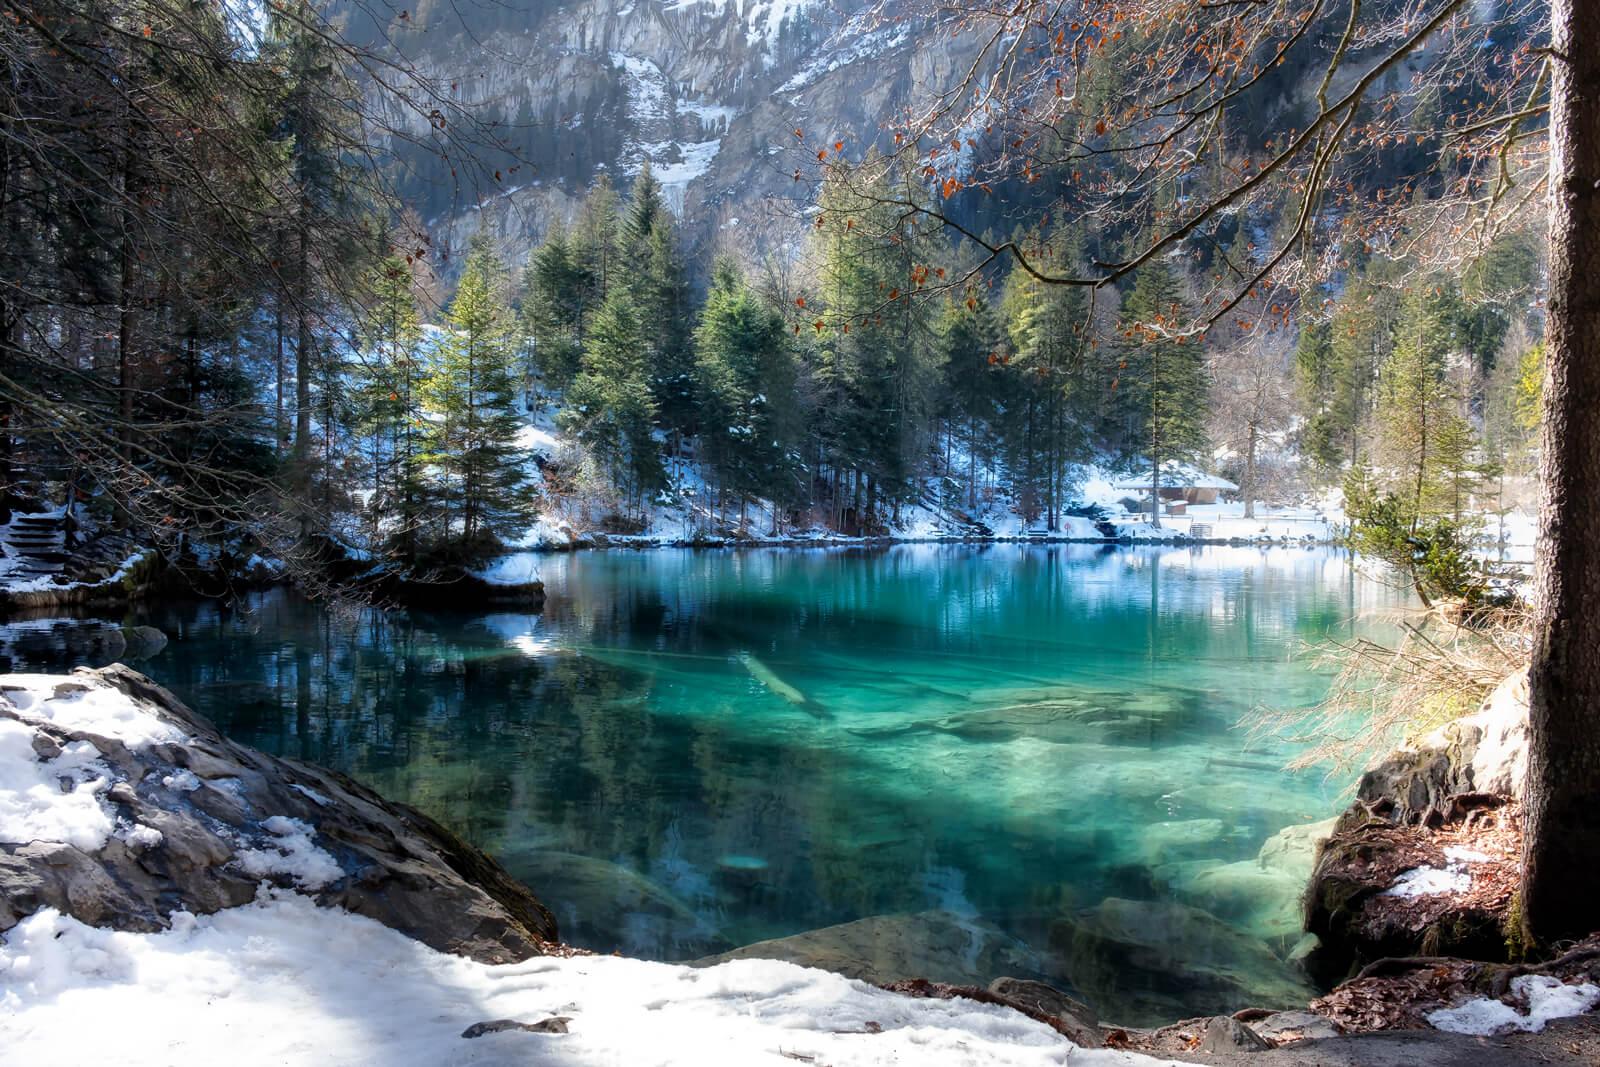 Lake Blausee in Switzerland during winter